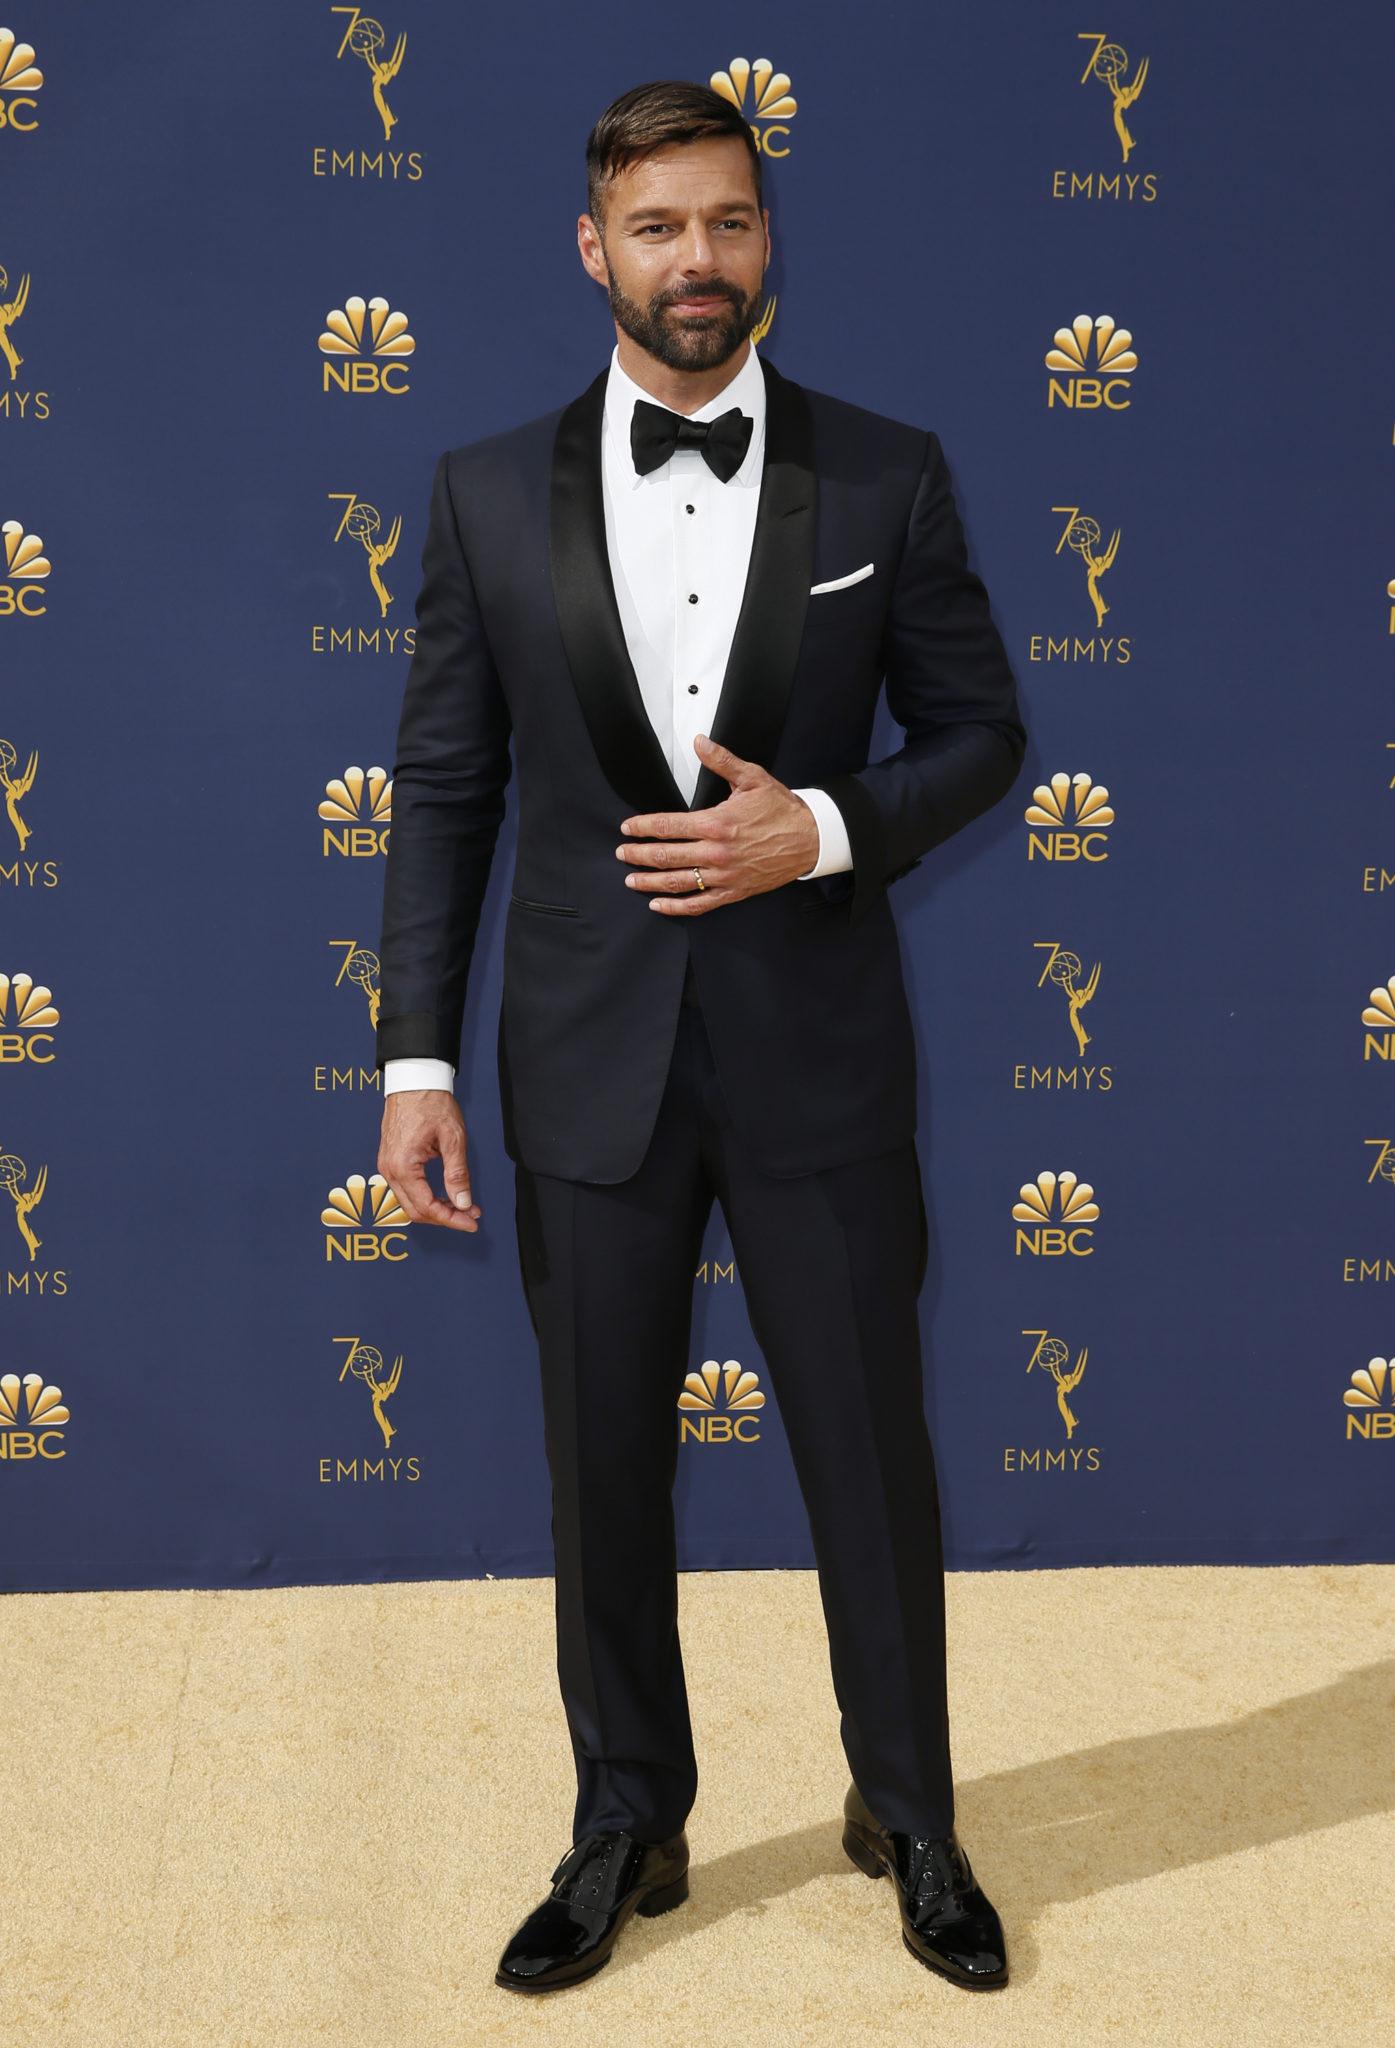 Ricky Martin Emmys 4Chion Lifestyle